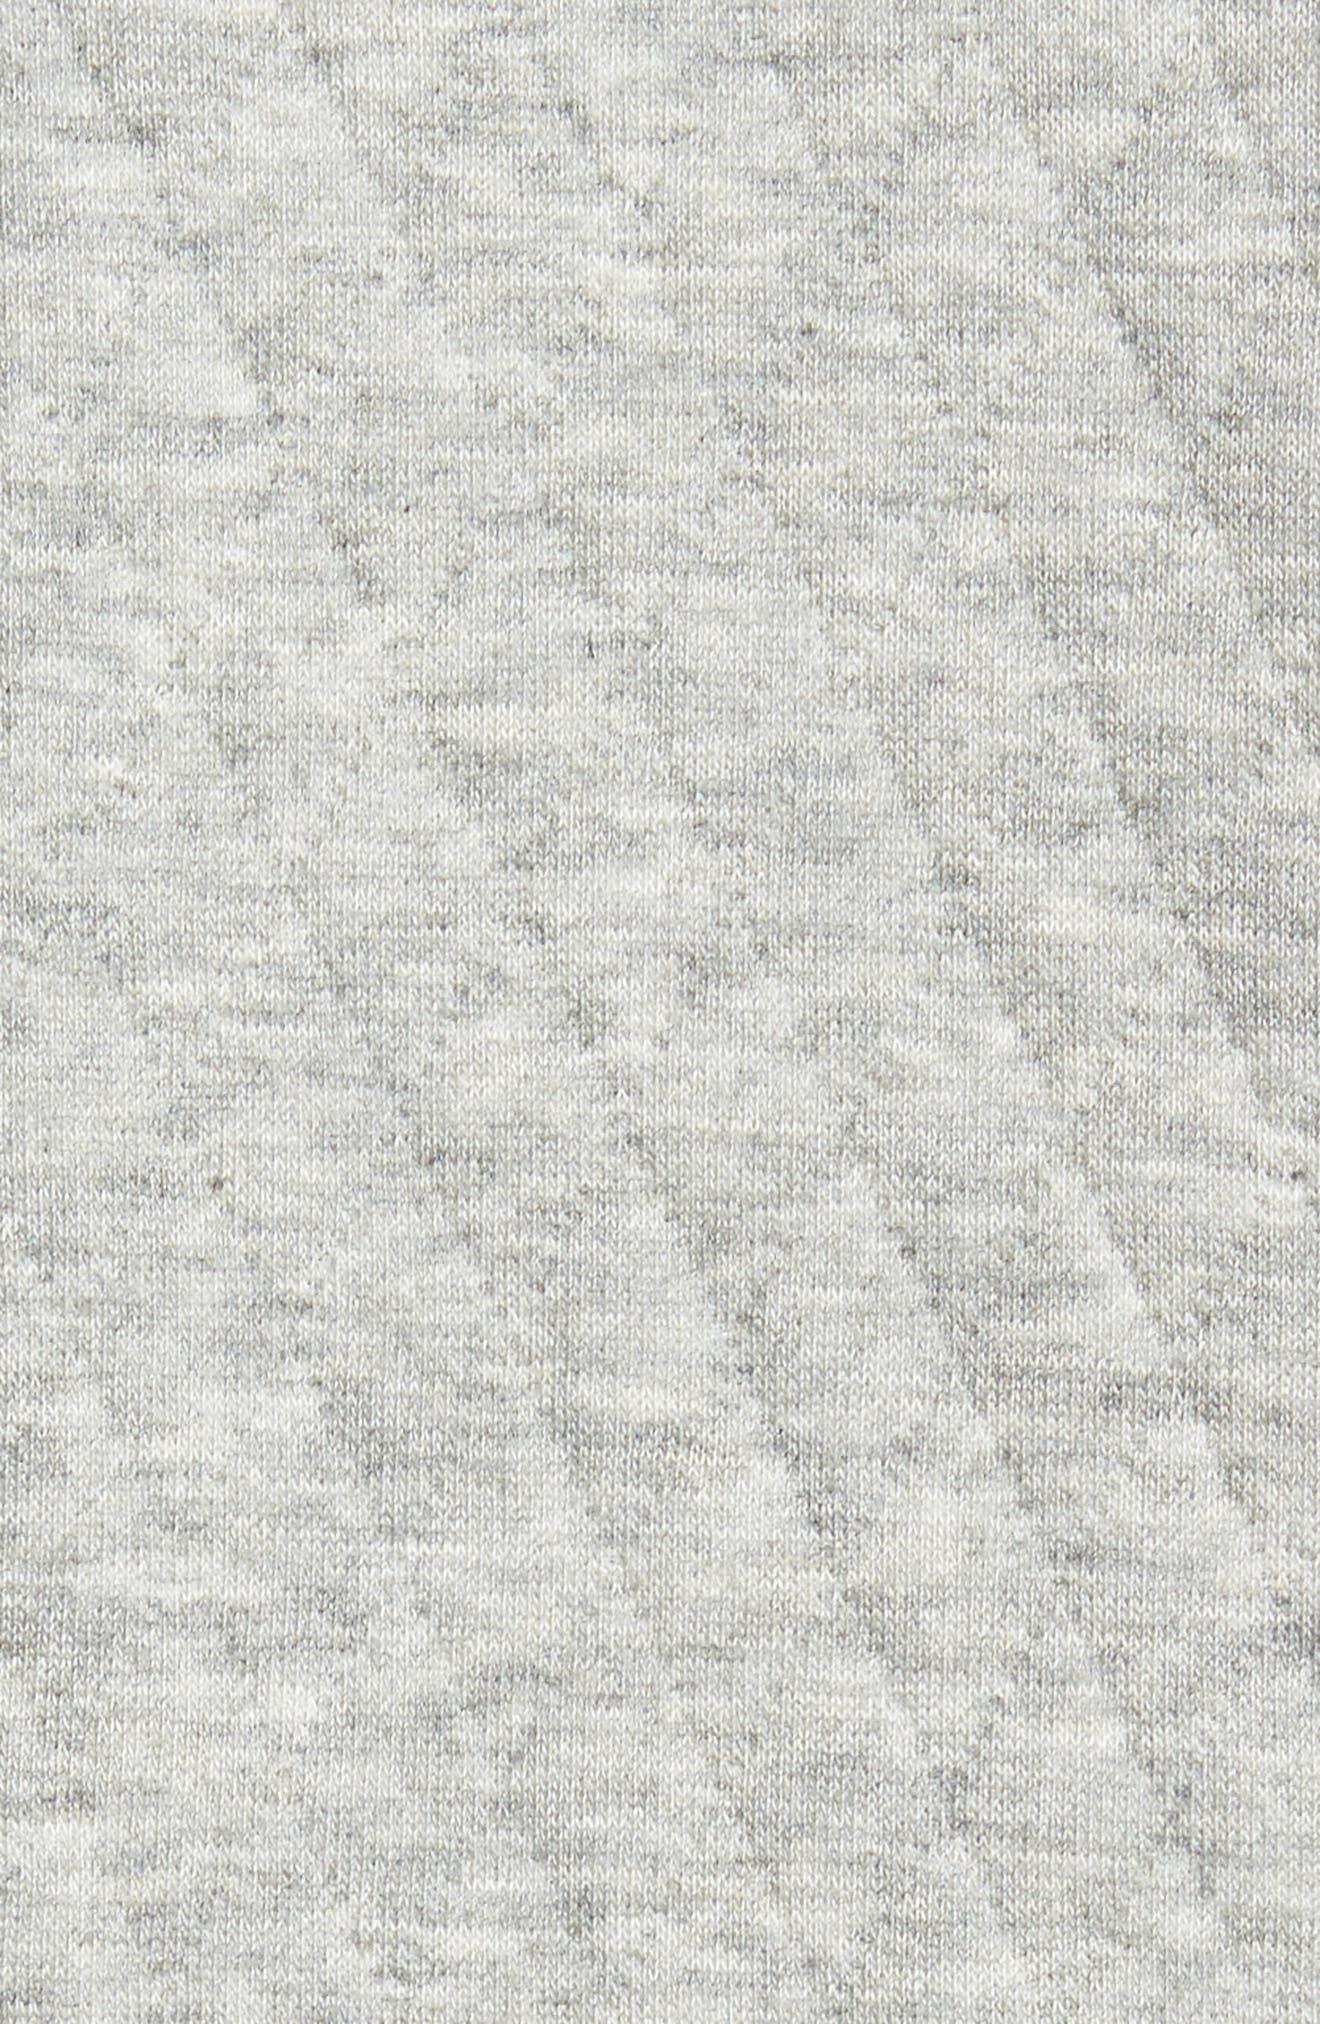 RODD & GUNN, Skipjack Pass Quilted Fleece Jacket, Alternate thumbnail 5, color, ASH